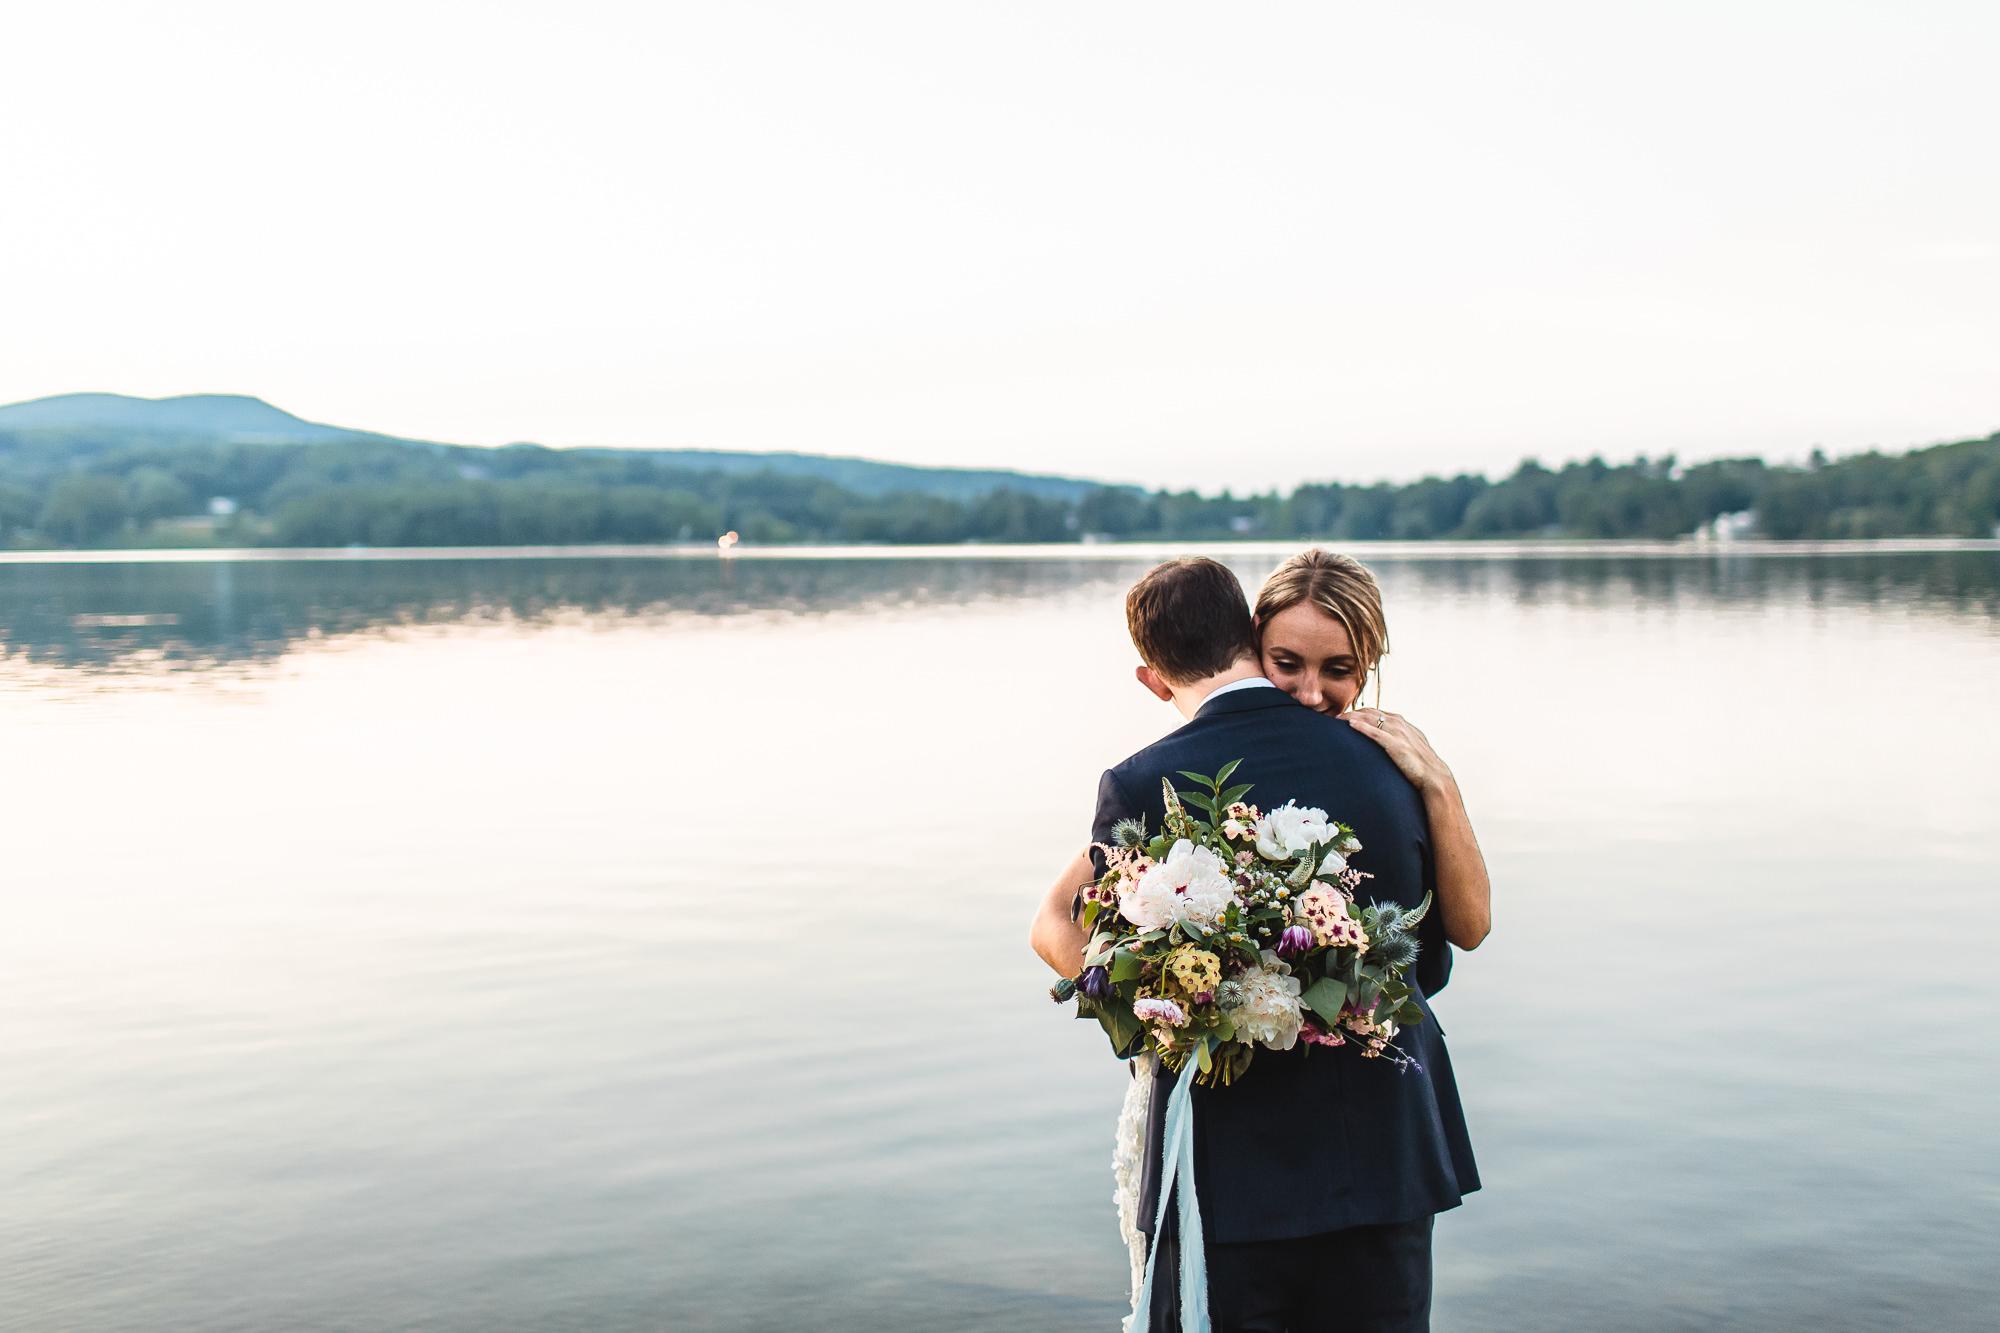 connecticut-summer-lake-wedding-emily-kirke-photography-upstyle (158 of 181).jpg